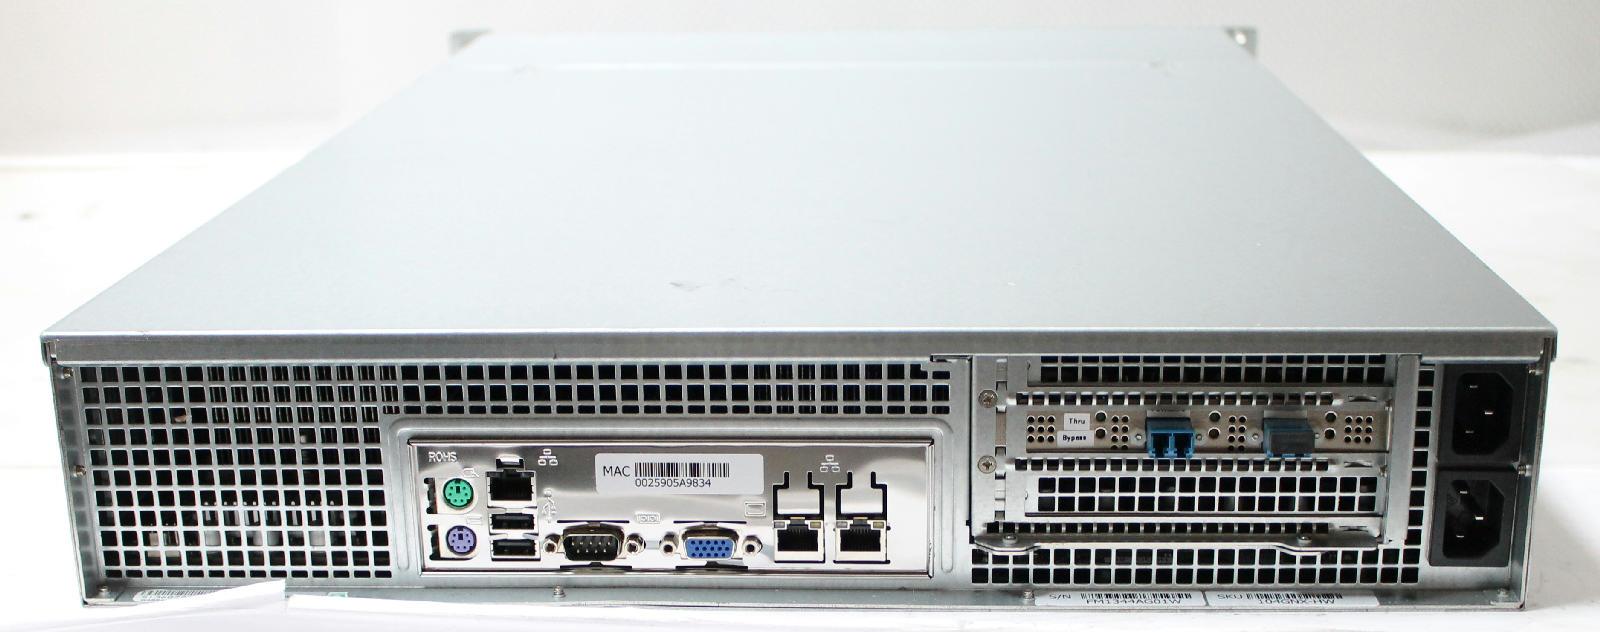 Fireeye Nx 10000 Network Security Appliance Malware